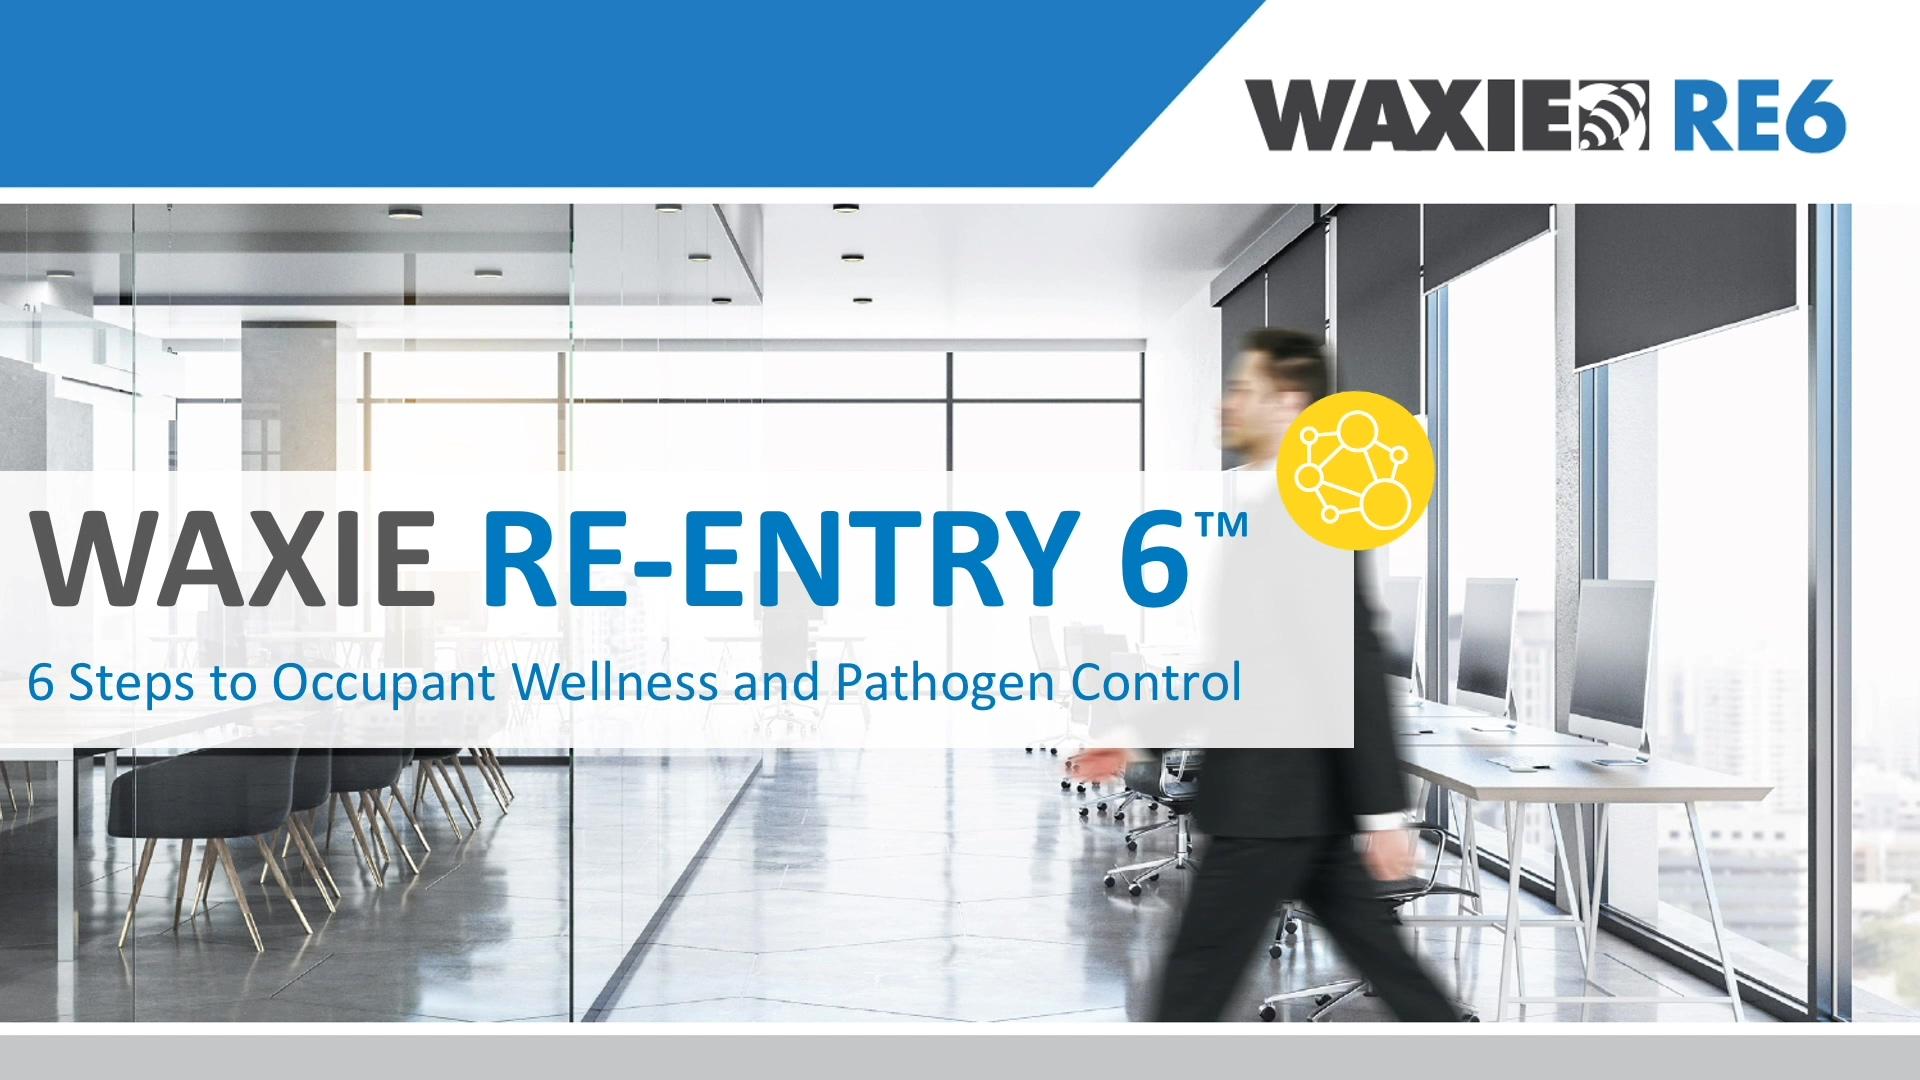 WAXIE RE6 Presentation 5-13